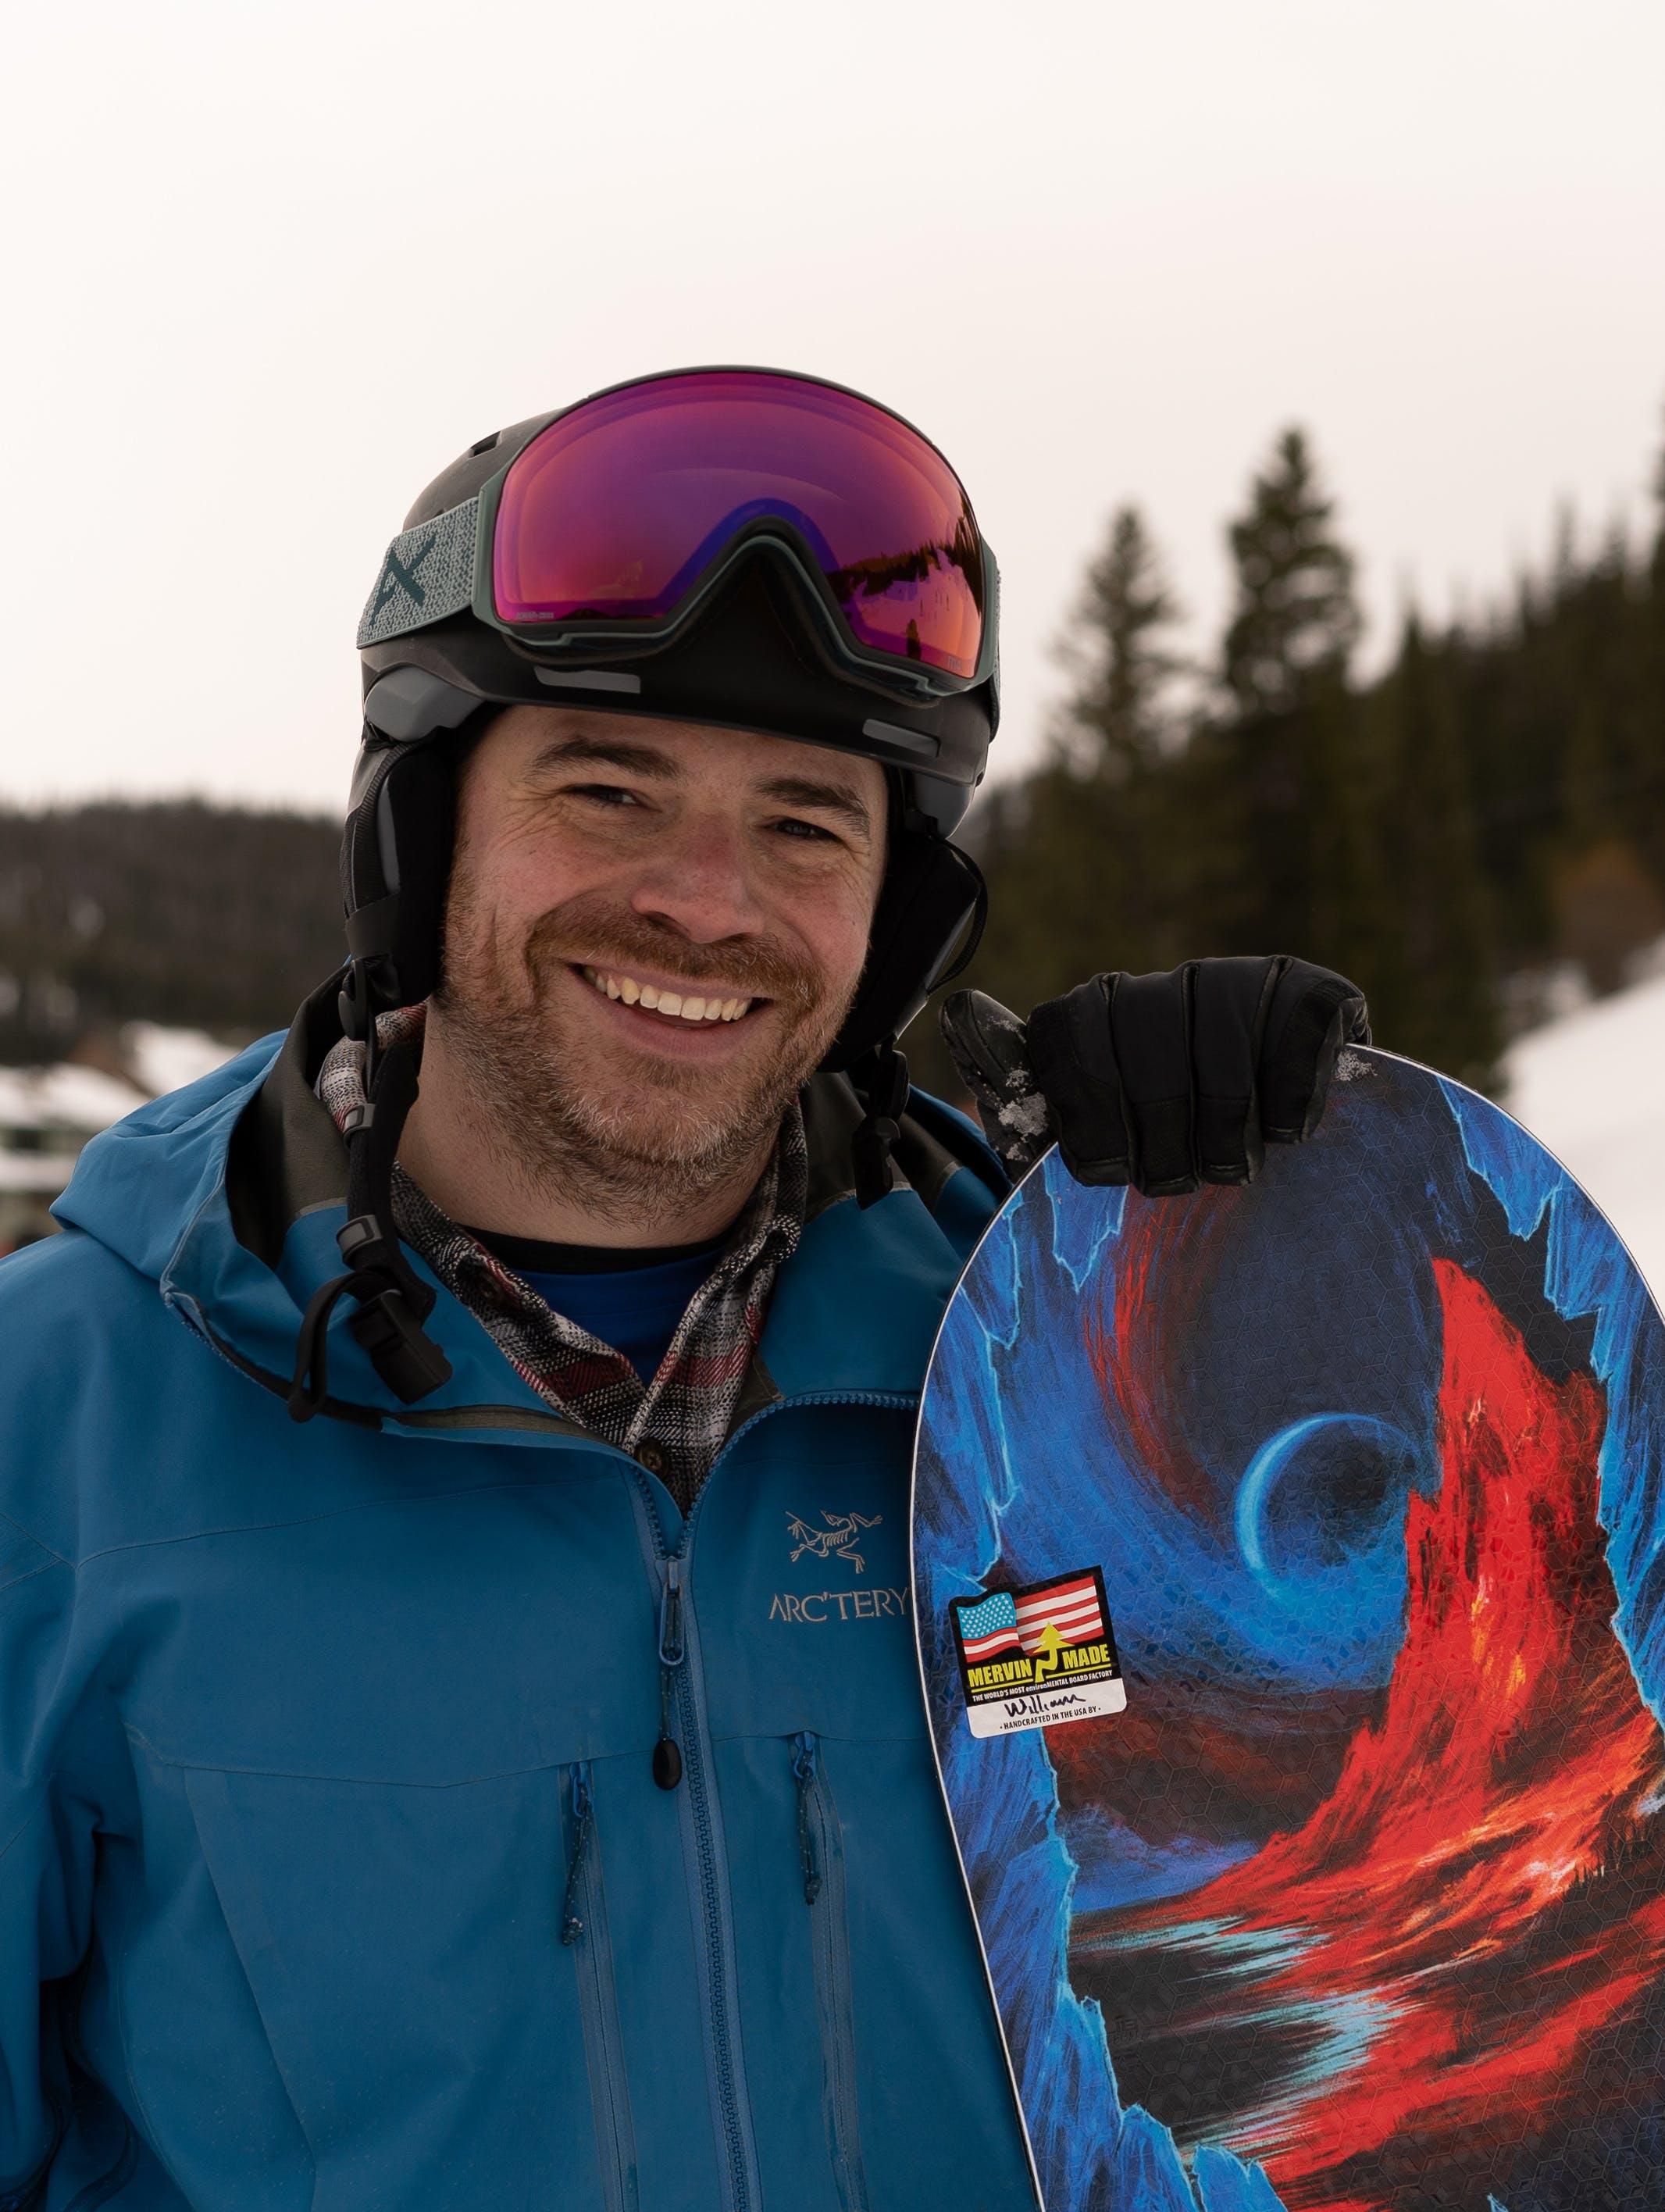 Winter Sports Expert Franco DiRienzo